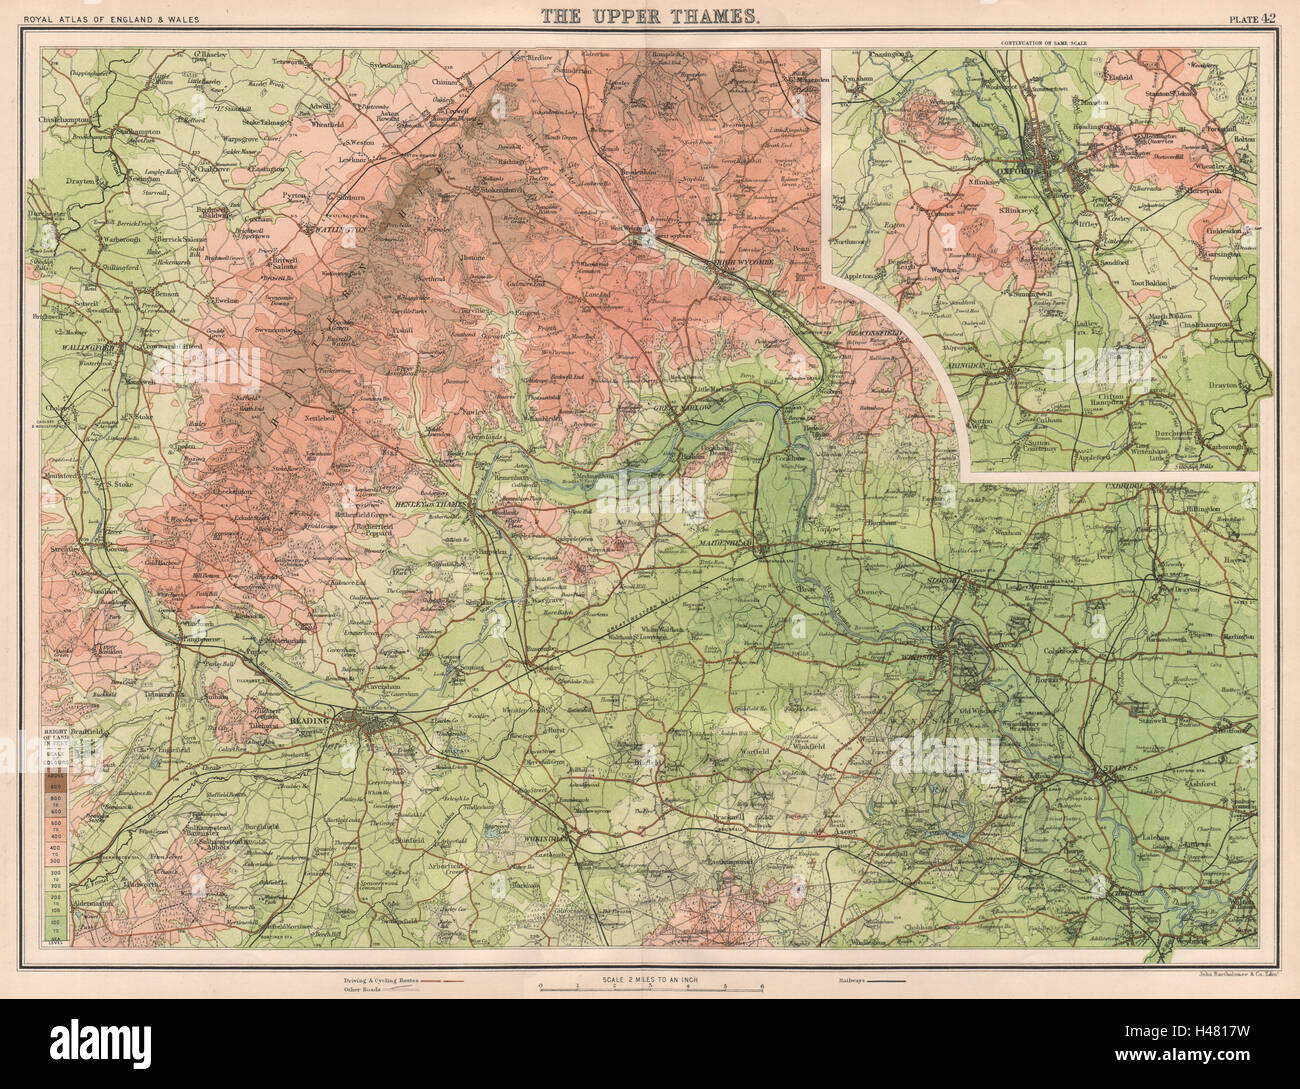 RICHTOWN SCHOOL MUELLER READING BERKS COUNTY PA COPY ATLAS MAP A.H 1884